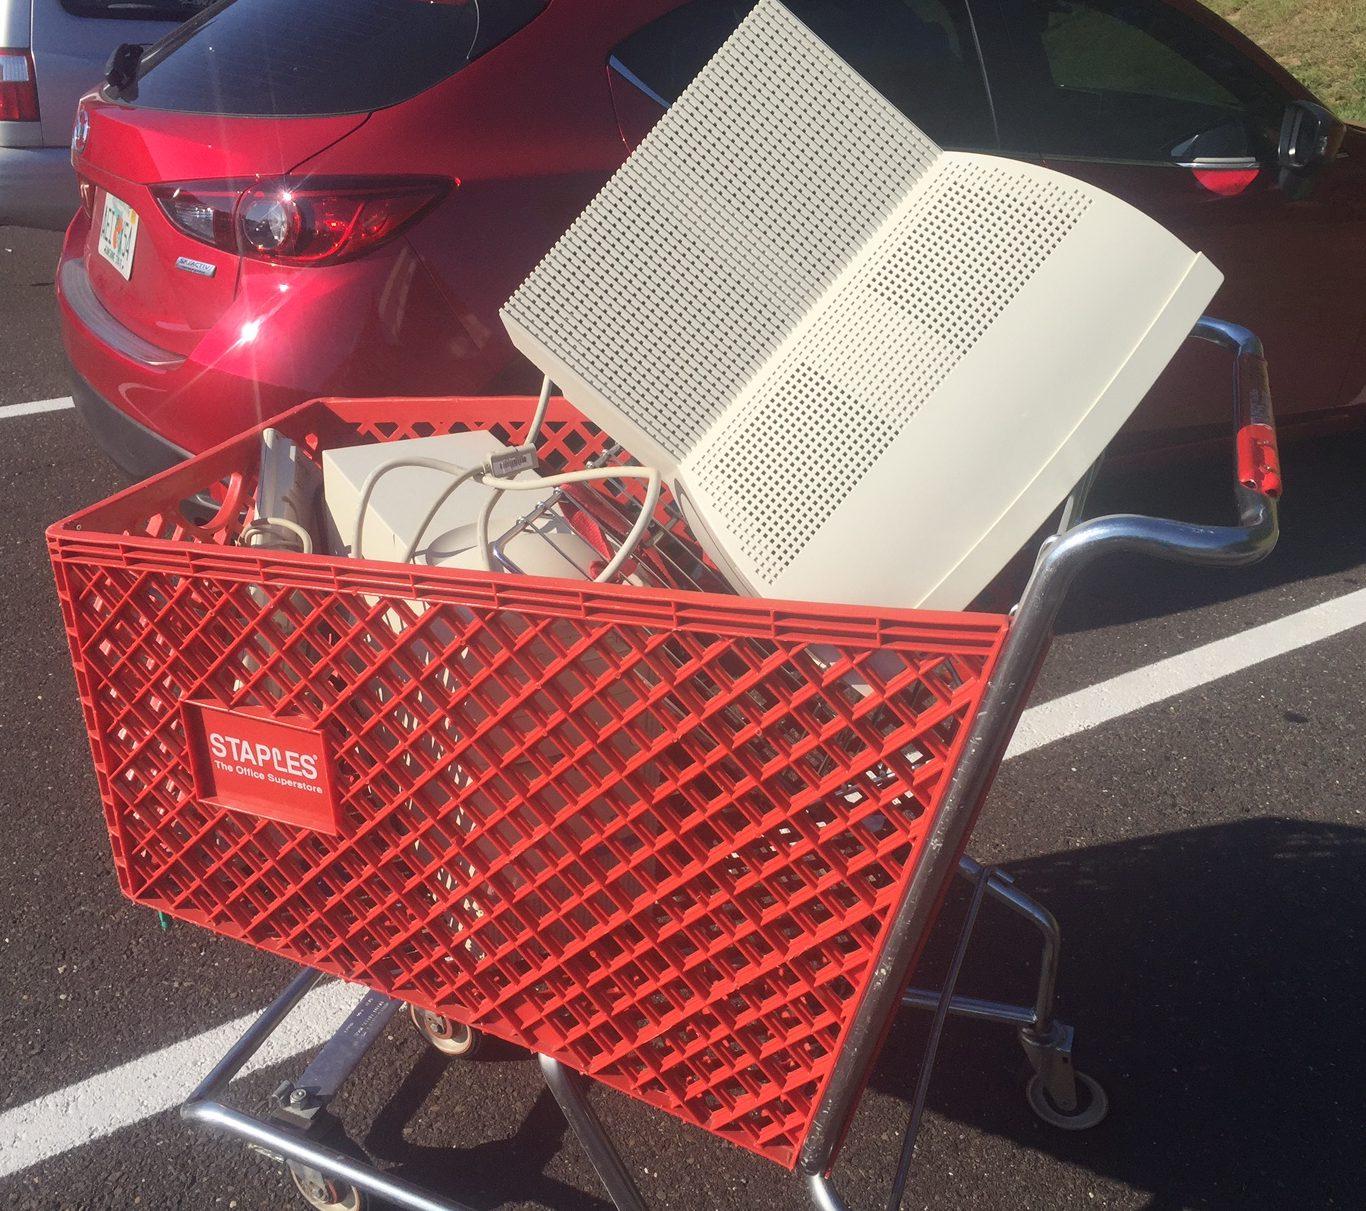 Shopping cart of old desktop computer, monitor and keyboard